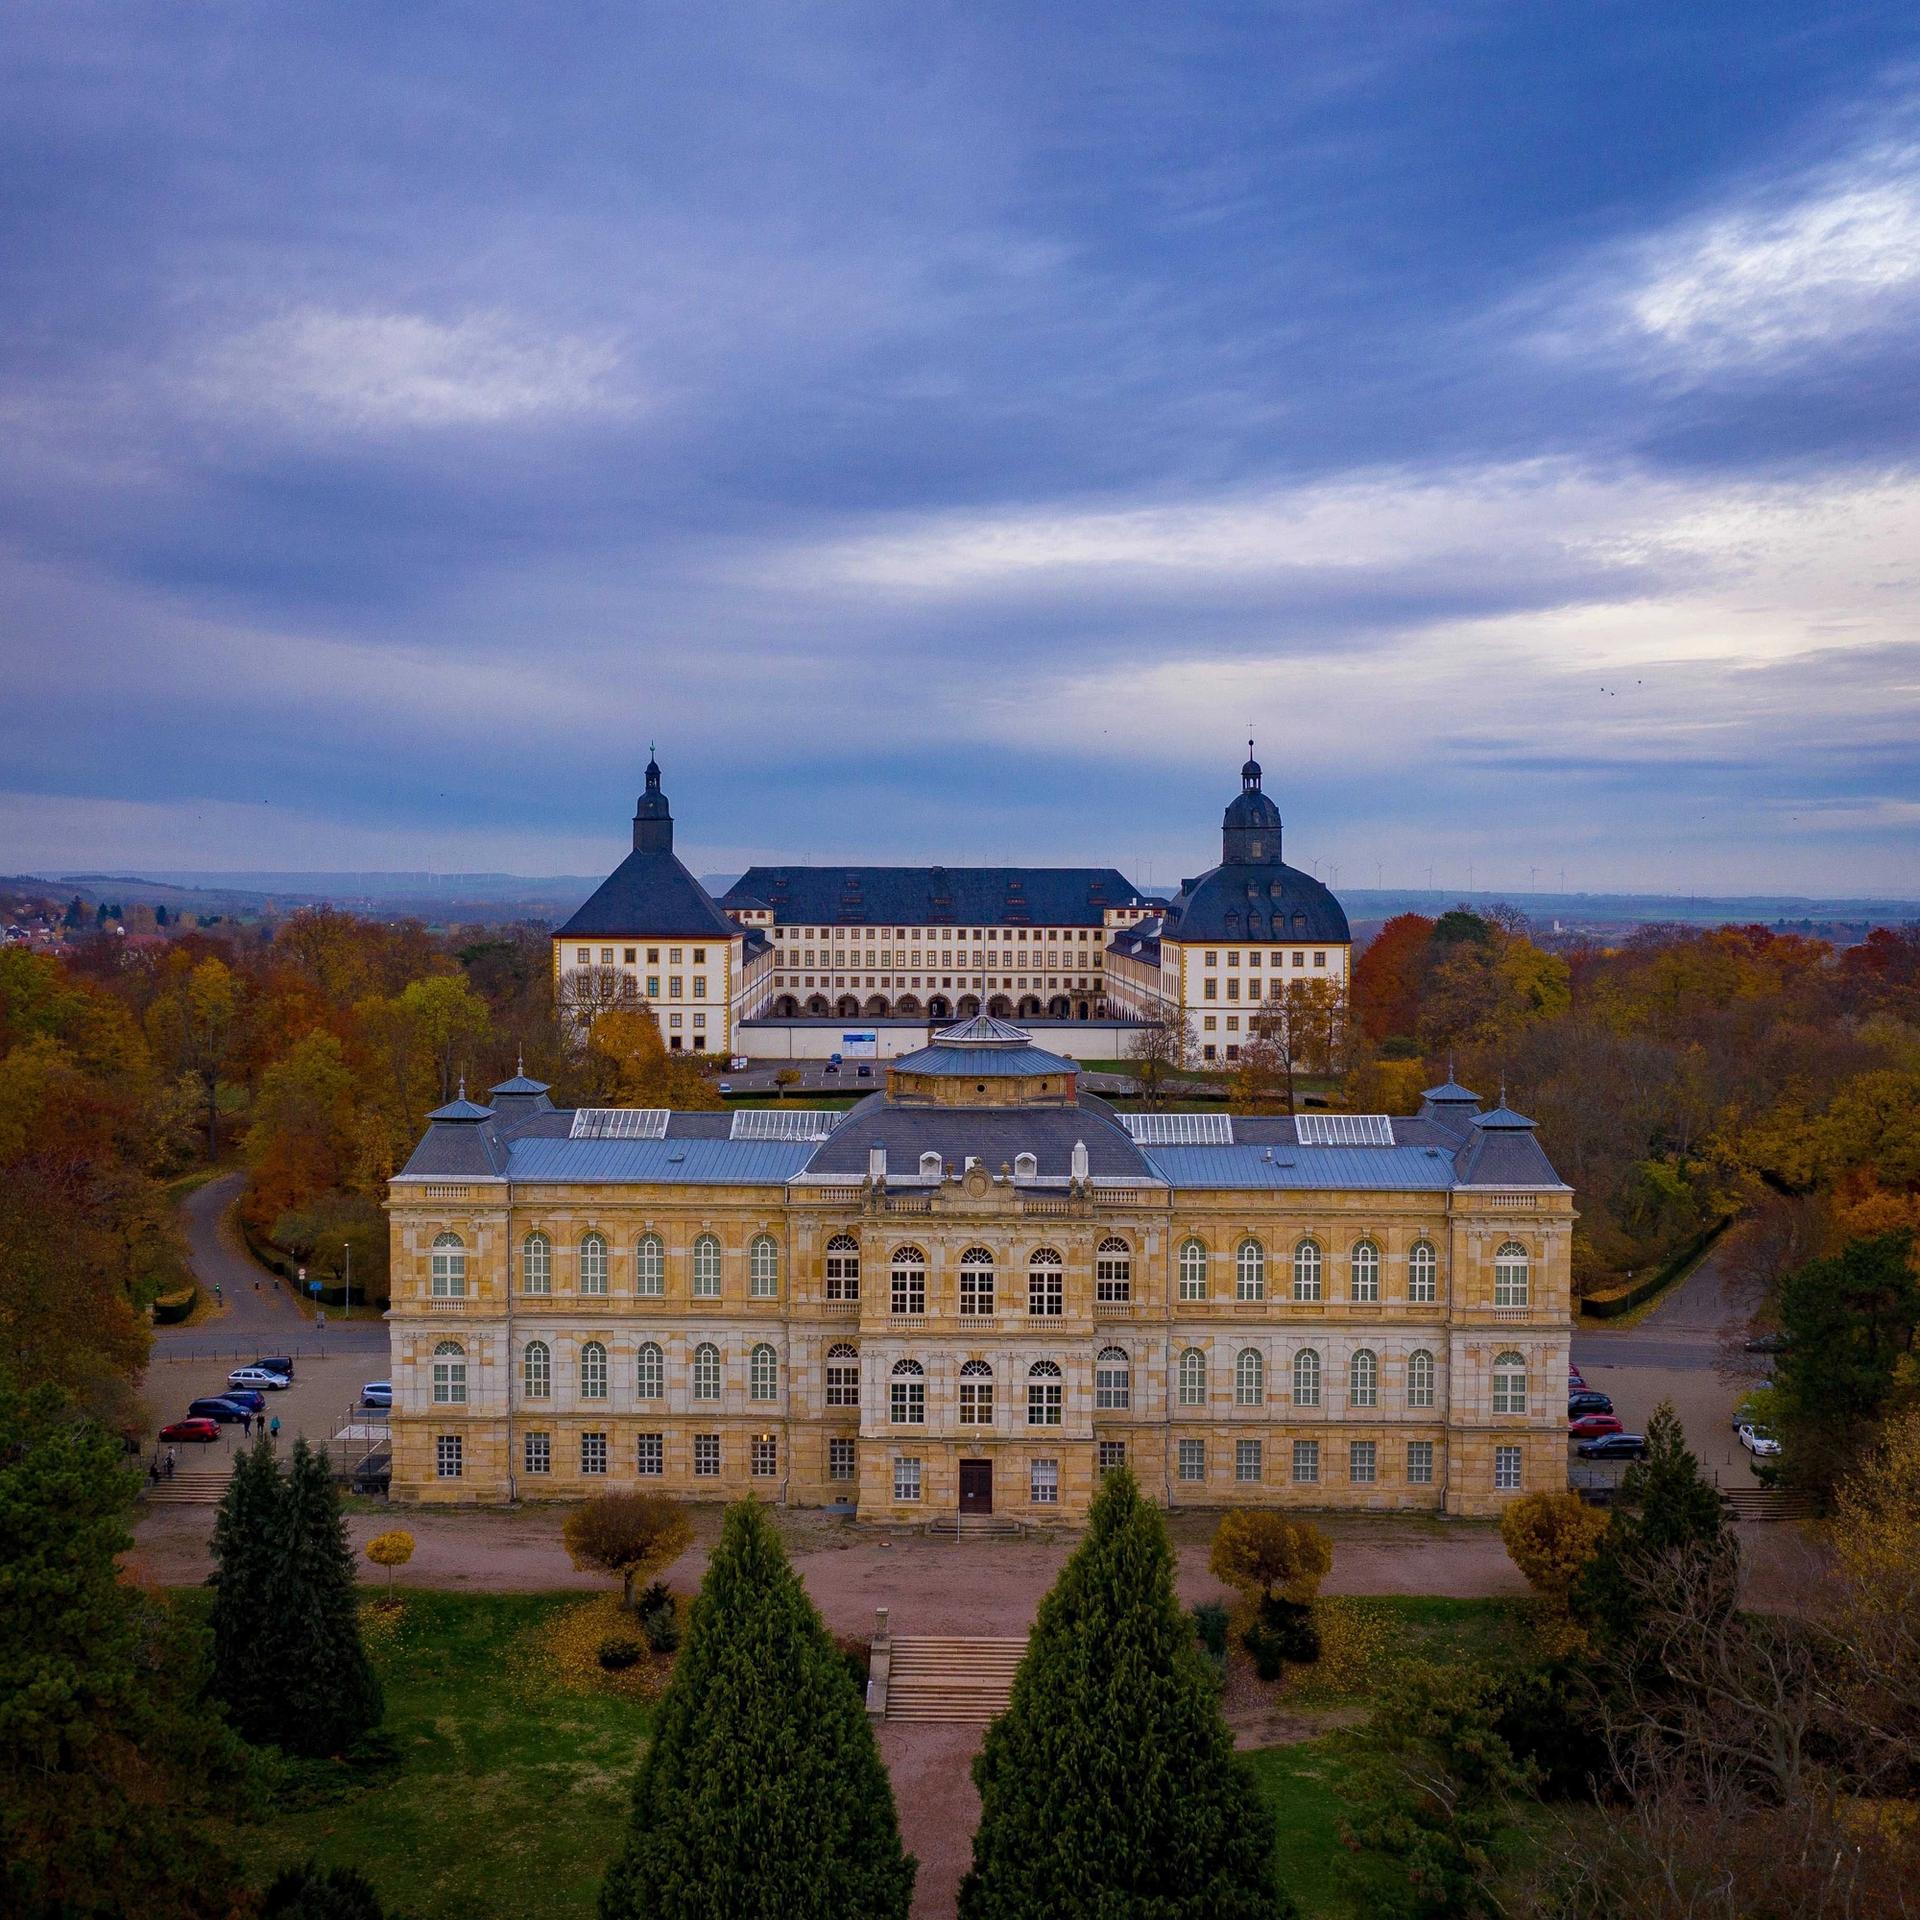 The baroque palace Schloss Friedenstein in Gotha will be the biggest beneficiary © Benjamin Bindewald